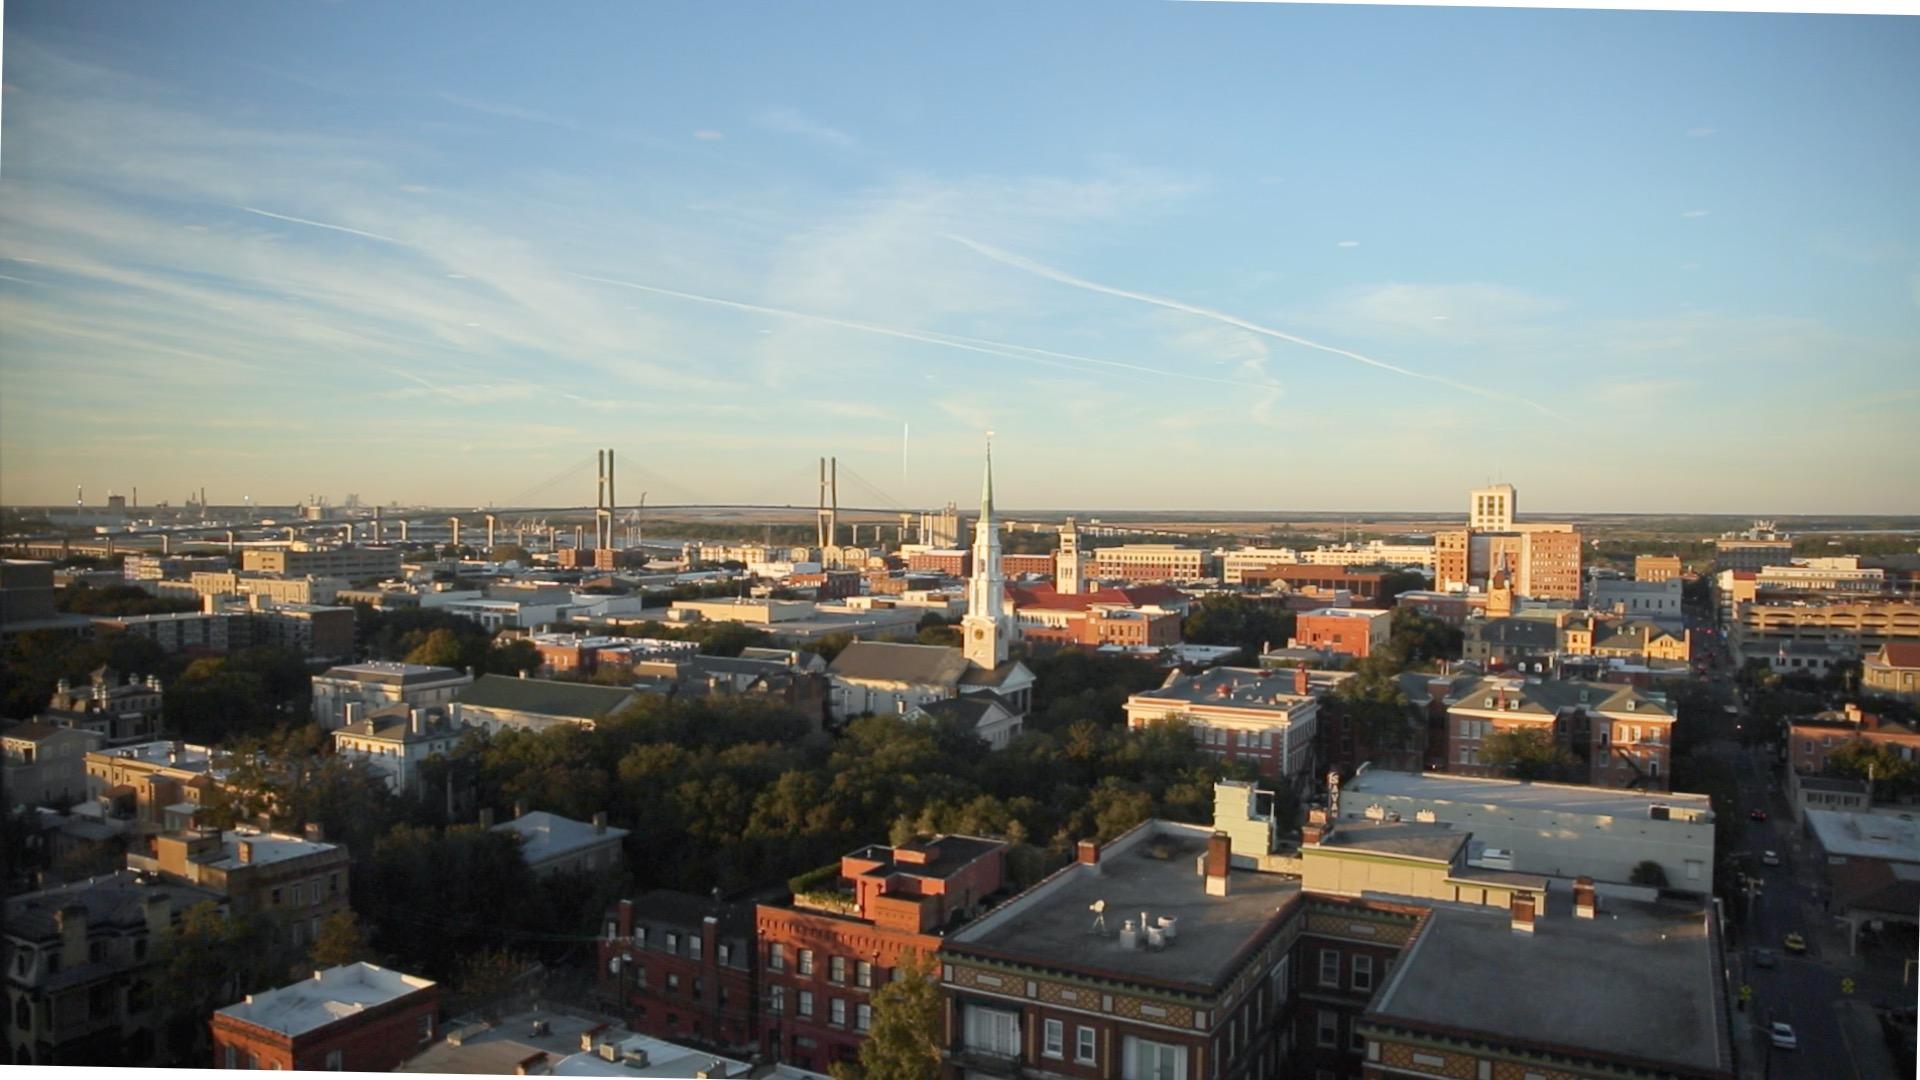 Savannah - Downtown